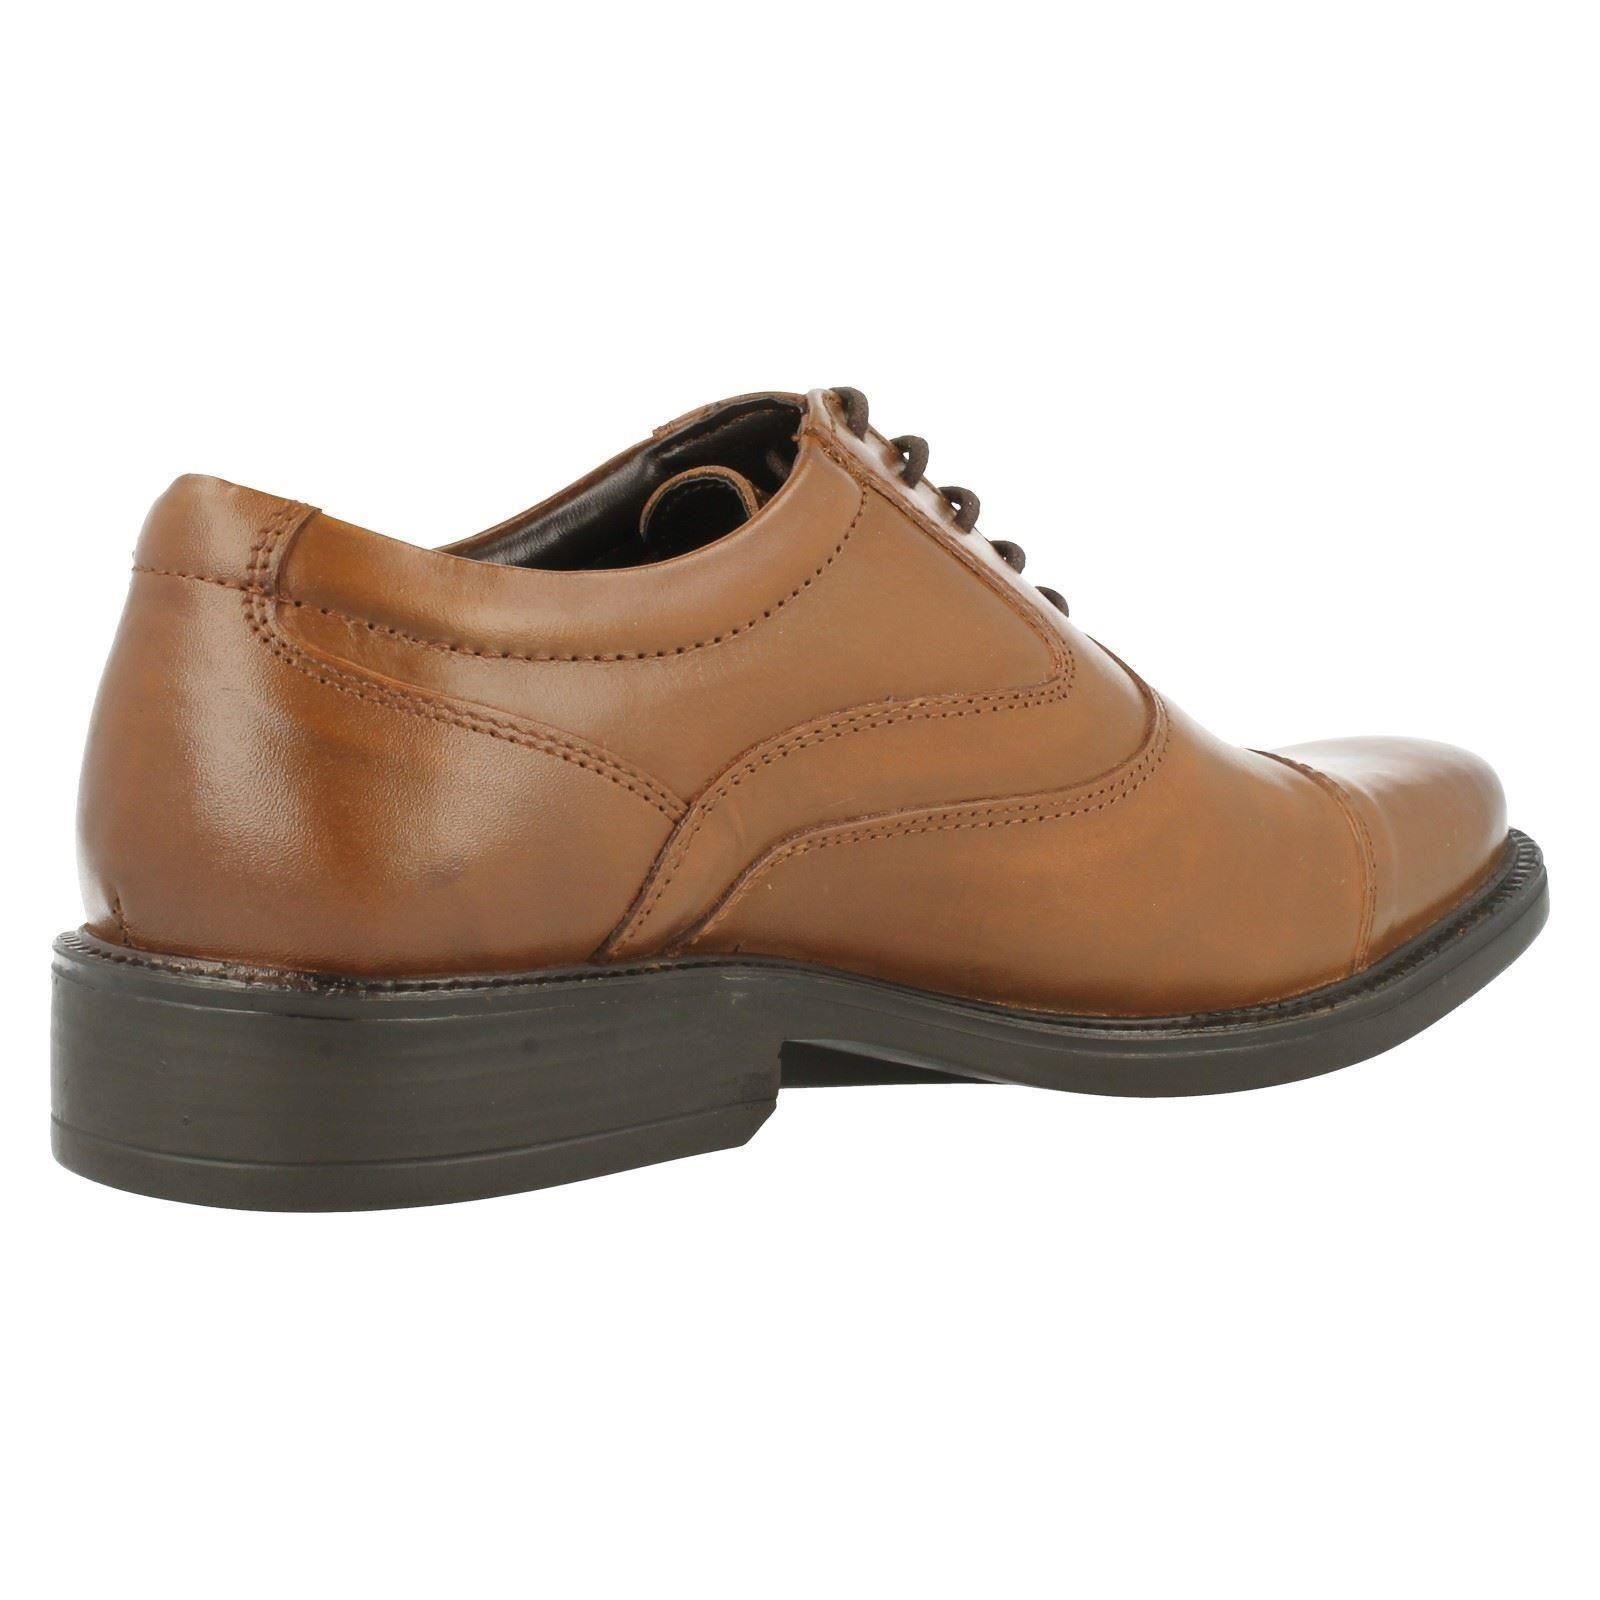 mens hush puppies formal oxford shoes rockford oxford ebay